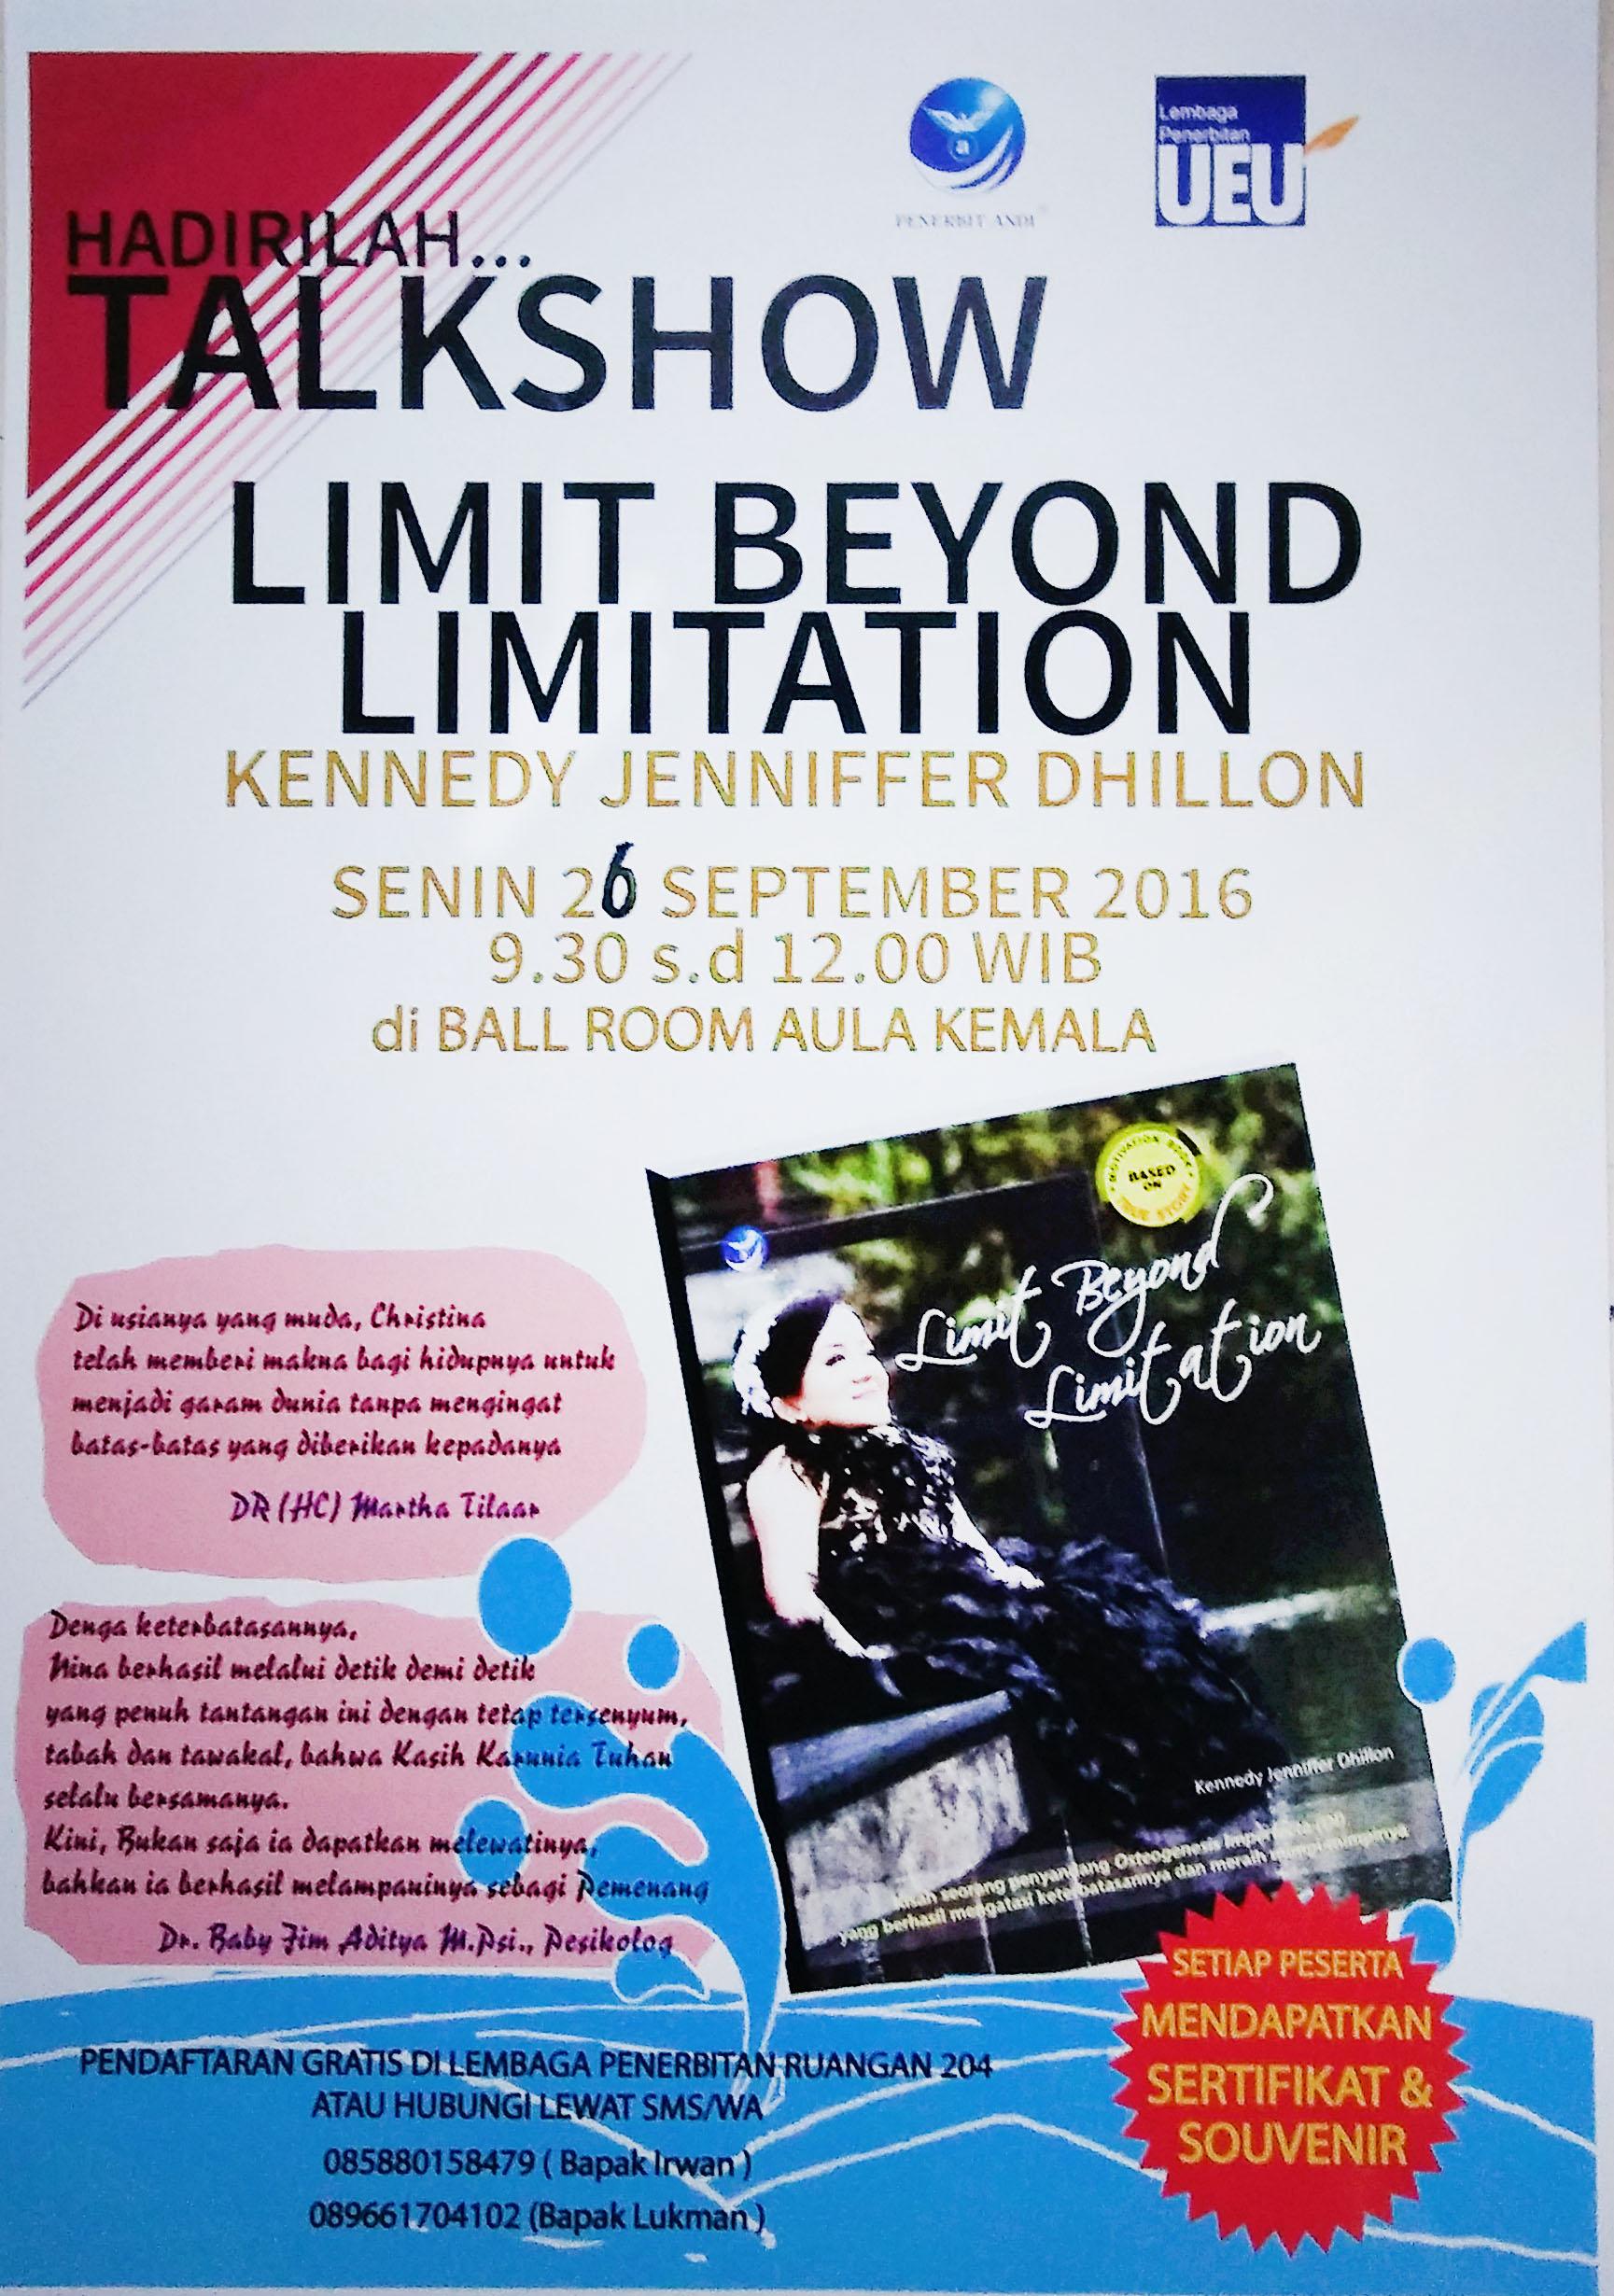 Talkshow Limit Beyond Limitation Universitas Esa Unggul 2016